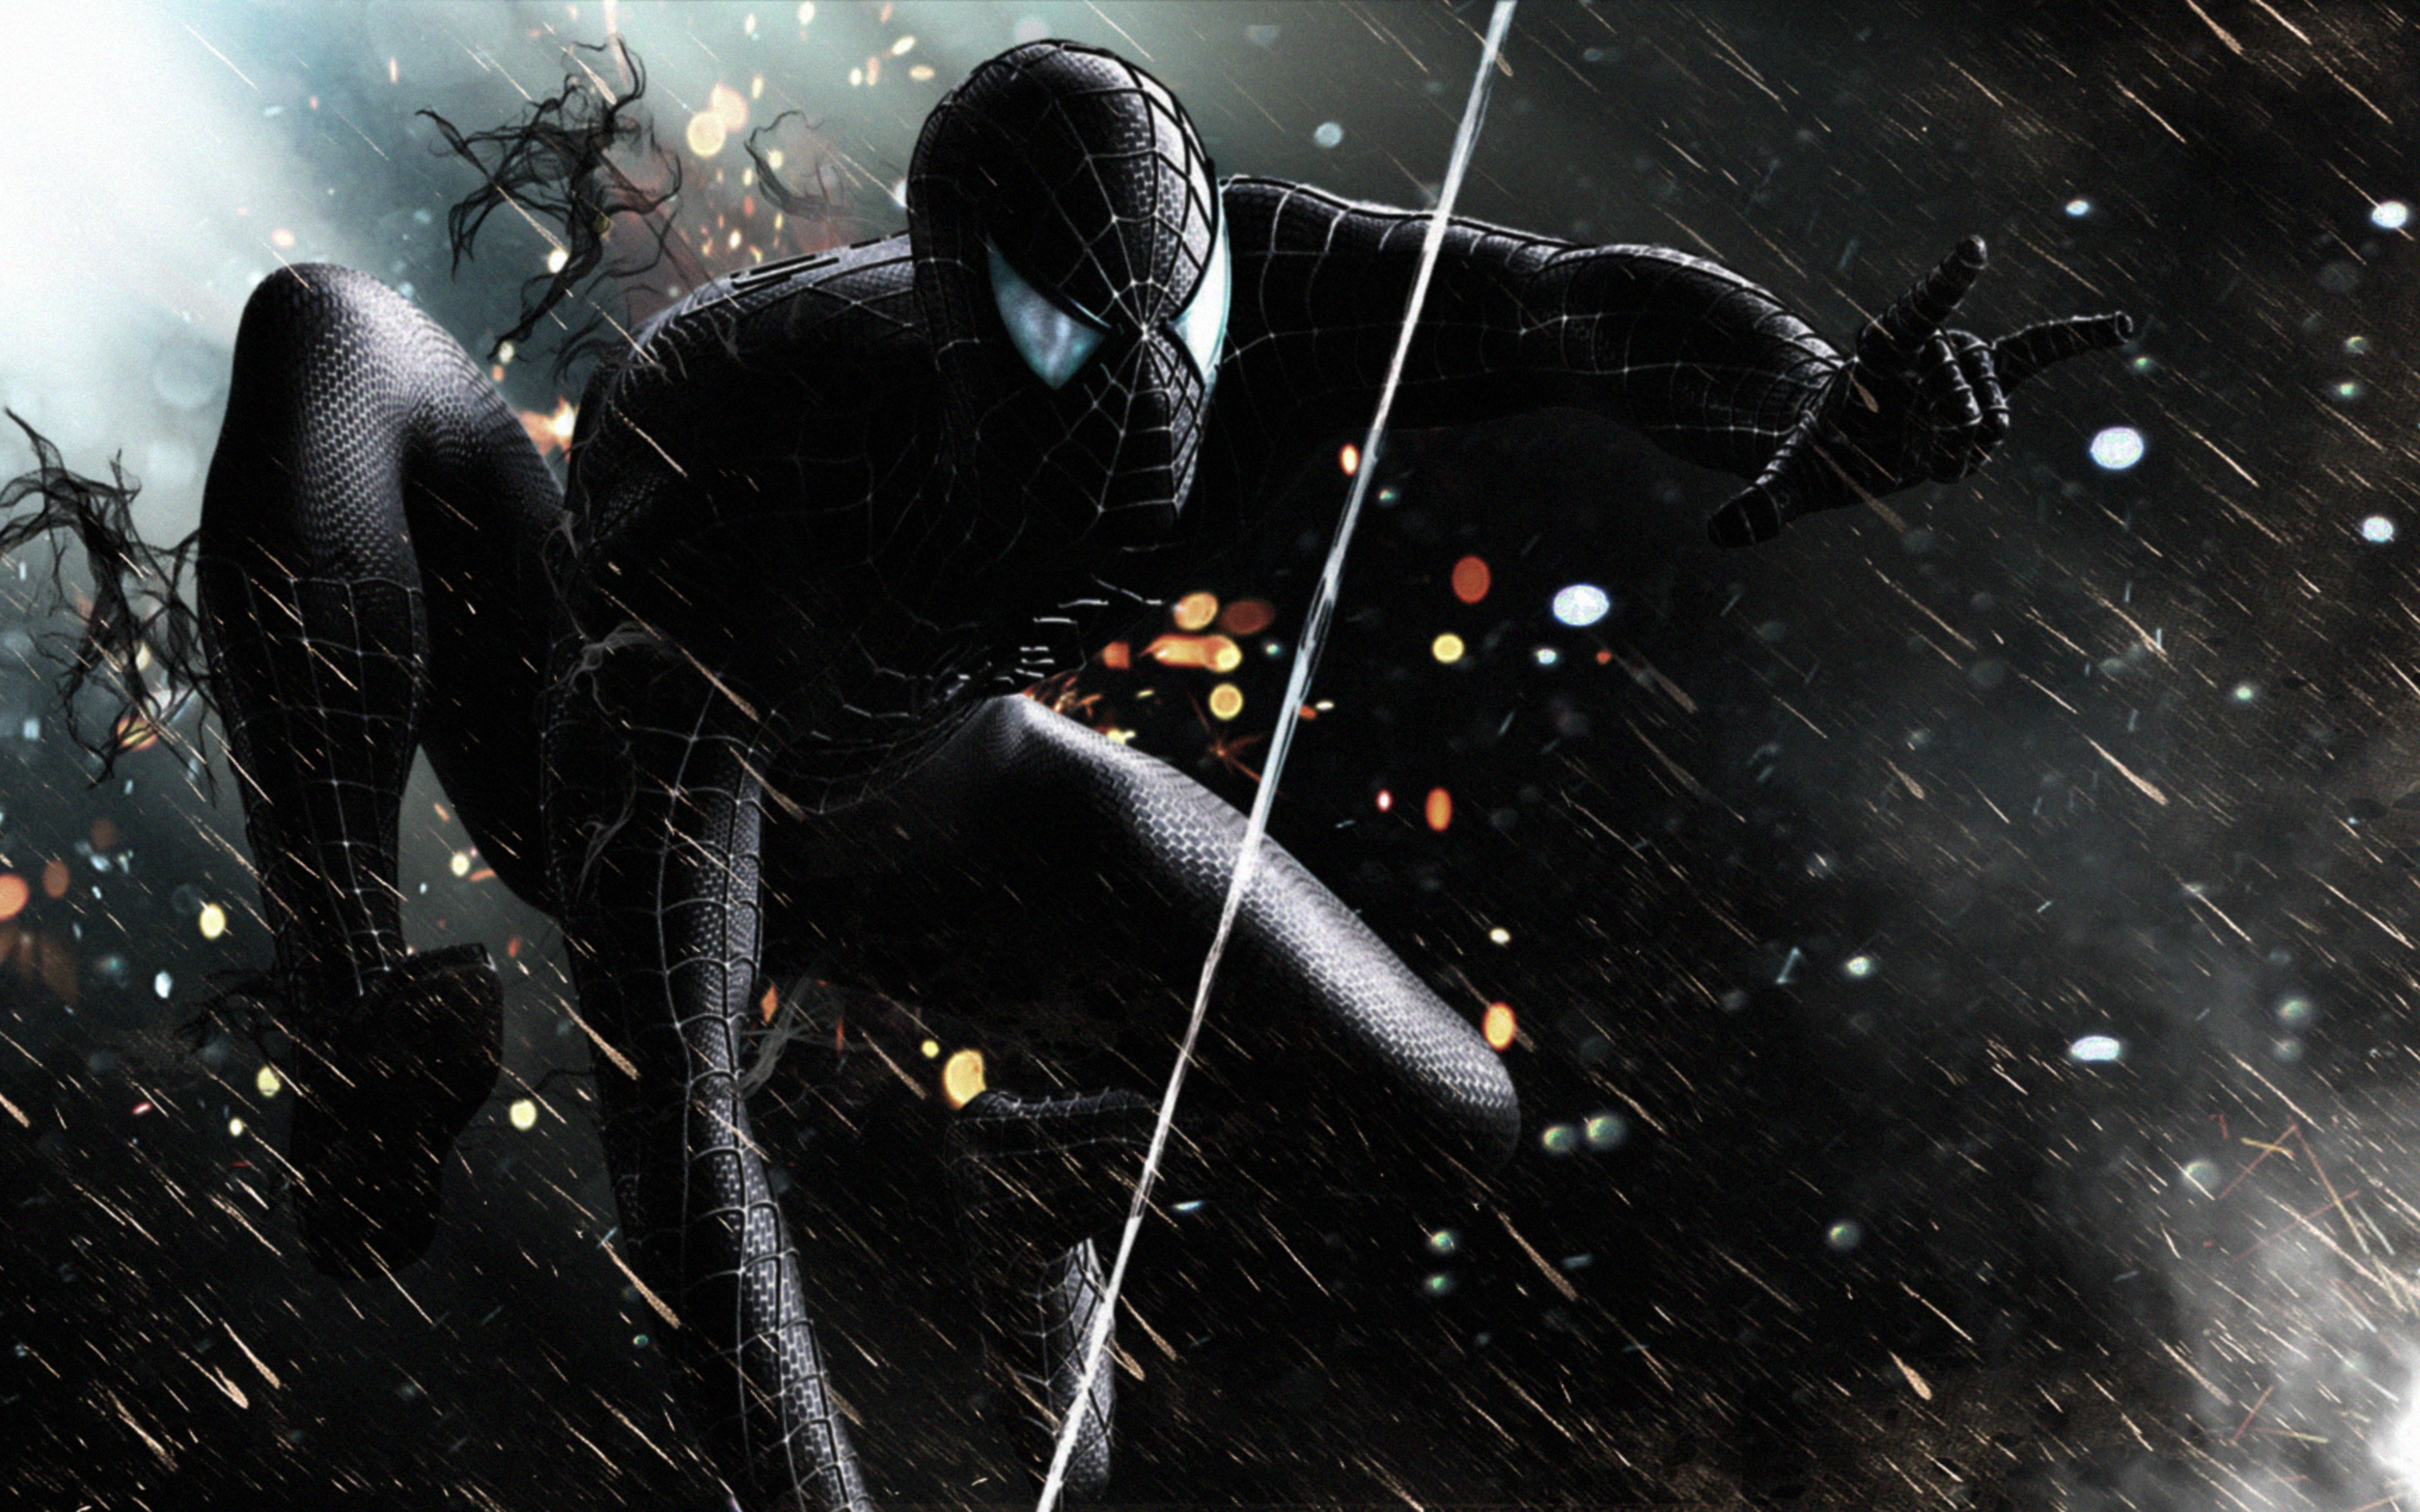 Spider Man 3 4k Ultra Hd Wallpaper Background Image 3840x2400